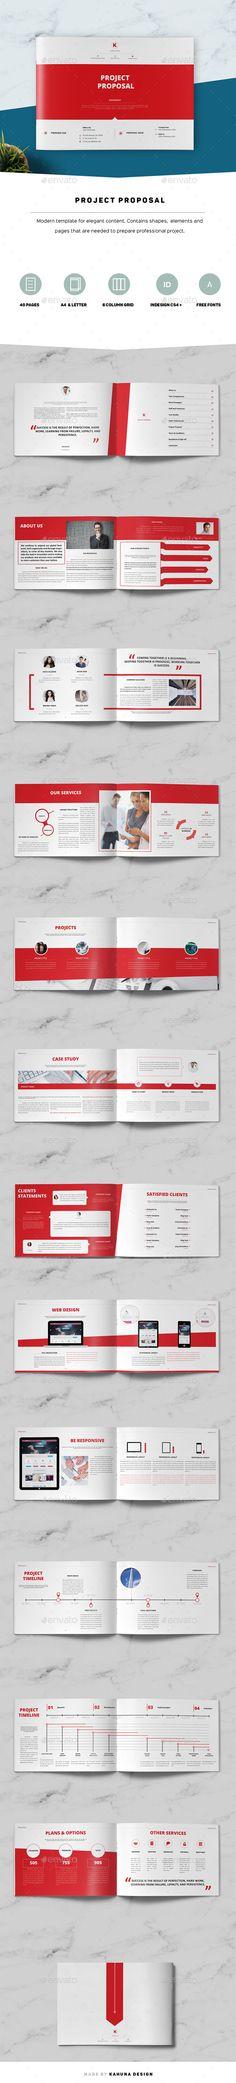 Project Proposal Landscape - #Informational #Brochures Download here: https://graphicriver.net/item/project-proposal-landscape/19542213?ref=alena994